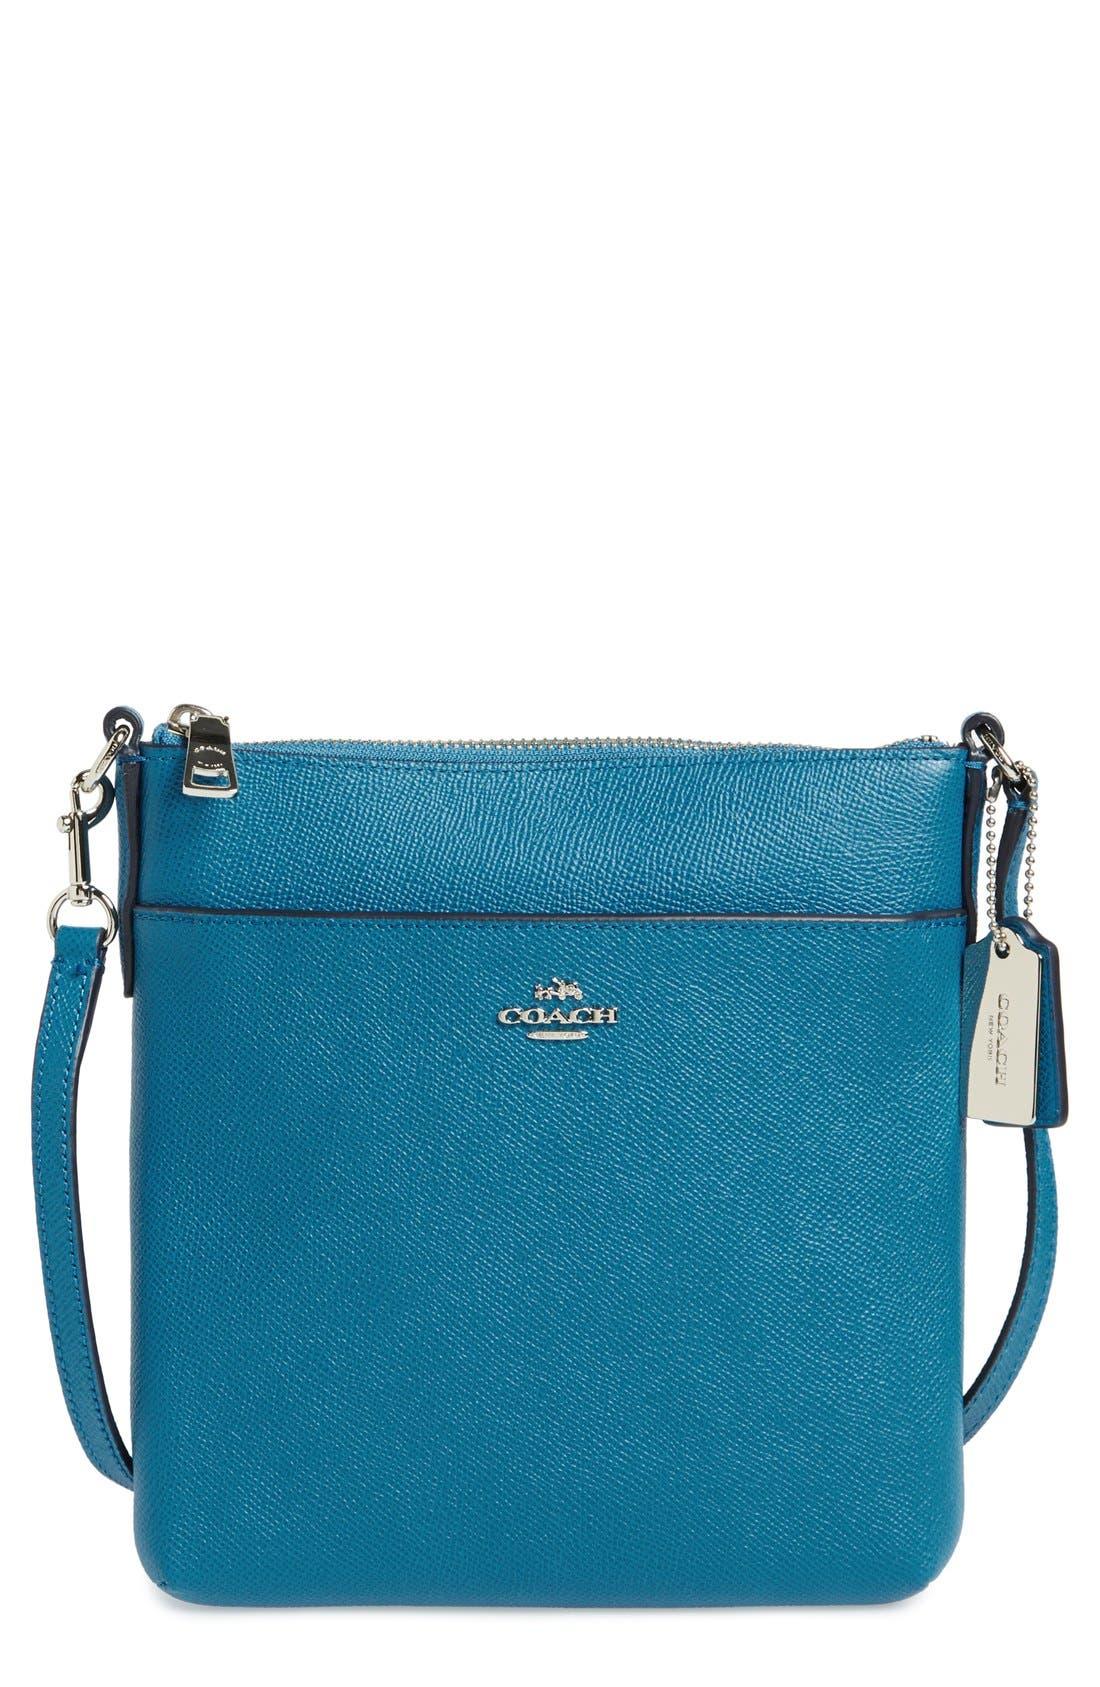 Leather Crossbody Bag,                         Main,                         color, Peacock